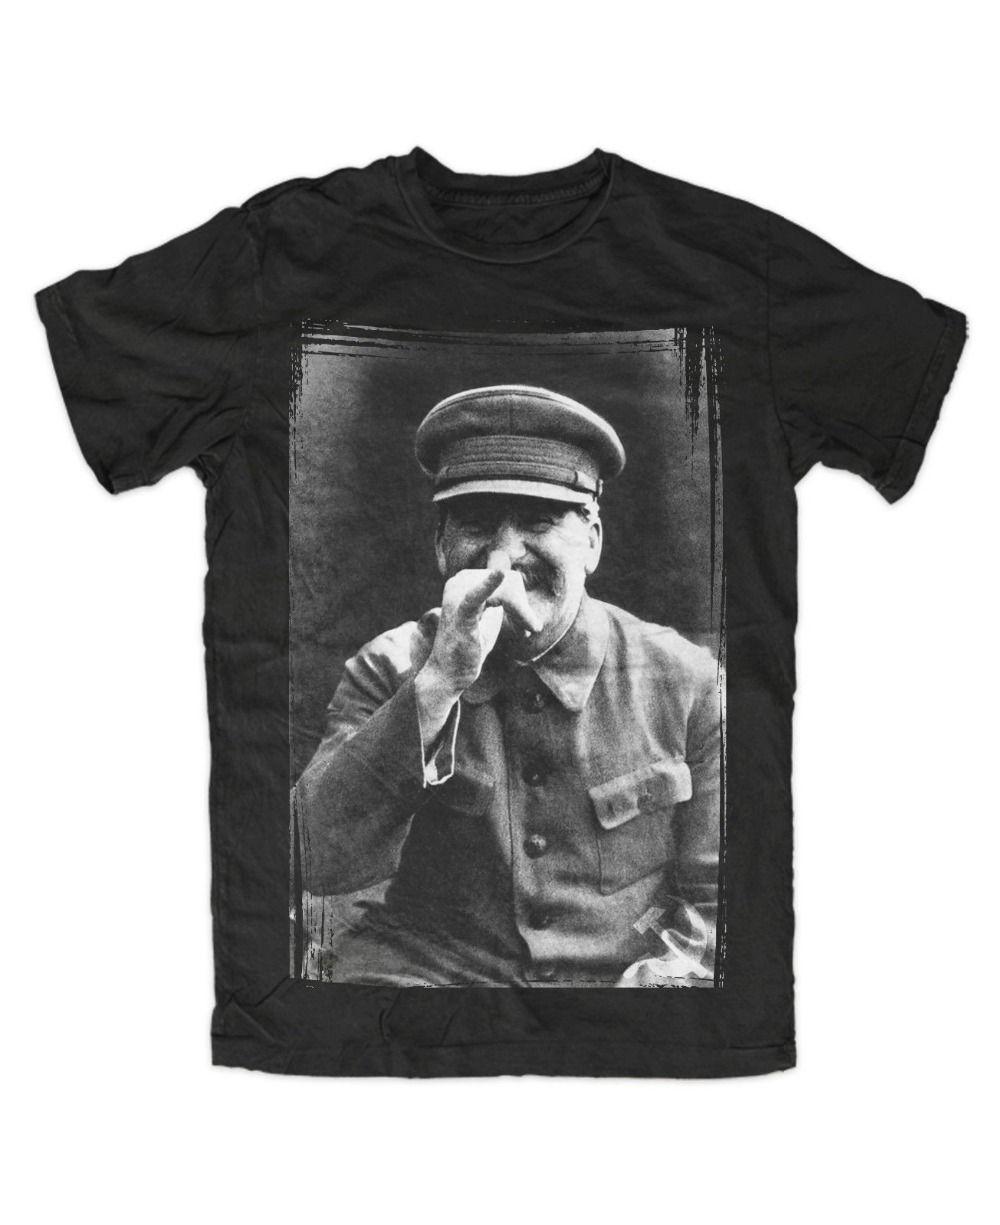 Uomo 2020 marchio di abbigliamento casual Tees Stalin Jokes T-Shirt schwarz, Russia, Josef, UDSSR, Kult, DDR, Lenin, camicia Revolution T